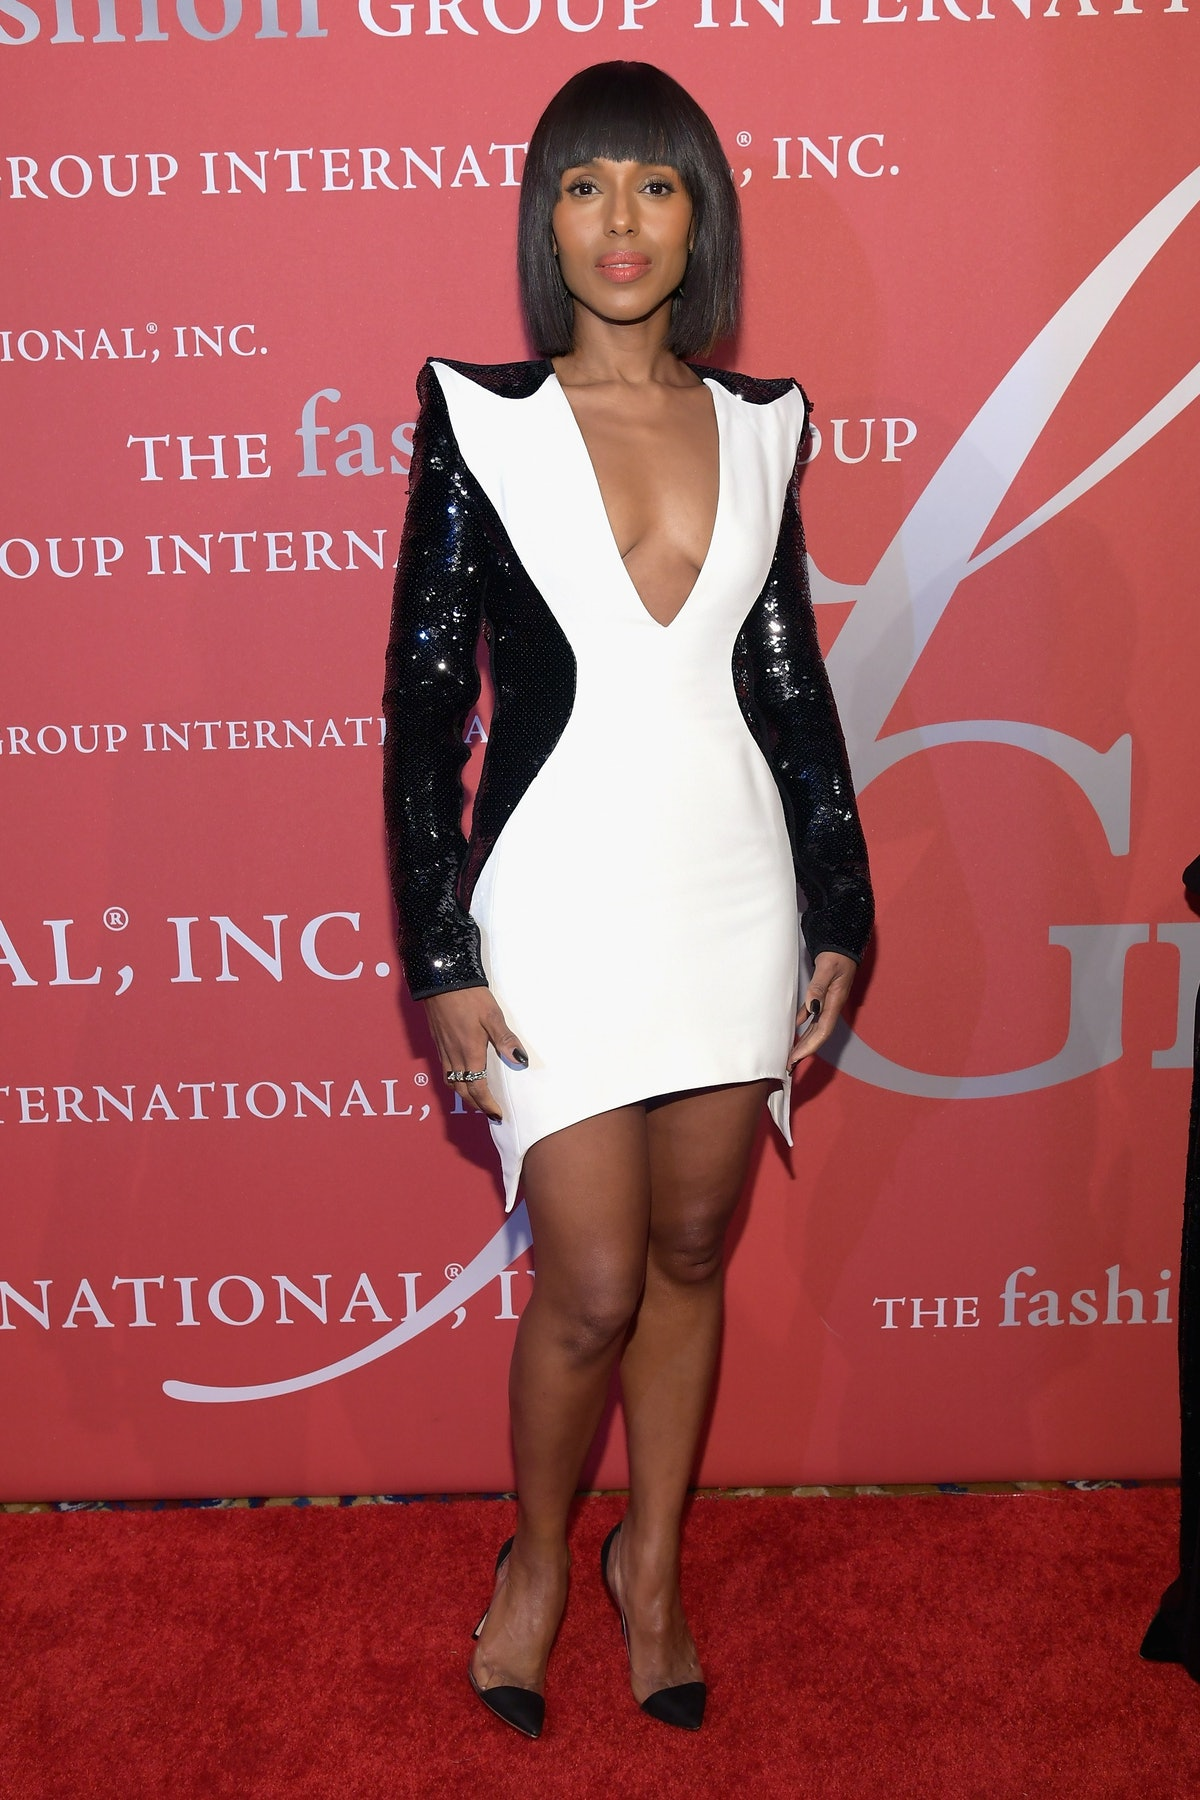 Kerry Washington Receives Lord & Taylor Fashion Oracle Award At FGI Night Of Stars Alongside Liz Rod...